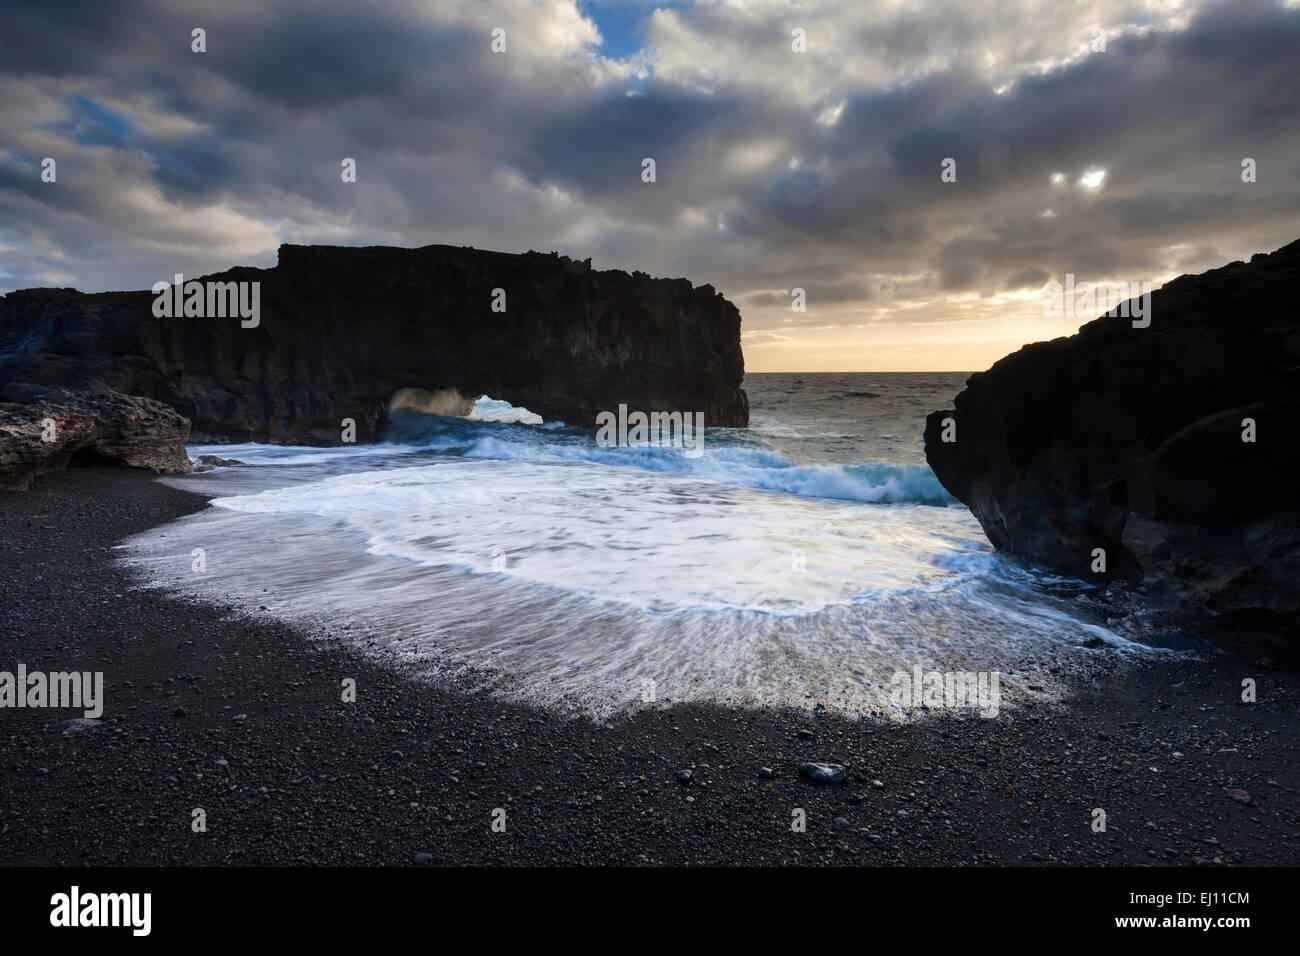 Playa de Las Cabras, Spanien, Europa, Kanarische Inseln, La Palma, Meer, Küste, Felsen, Klippe, Bogen, Morgenlicht Stockbild